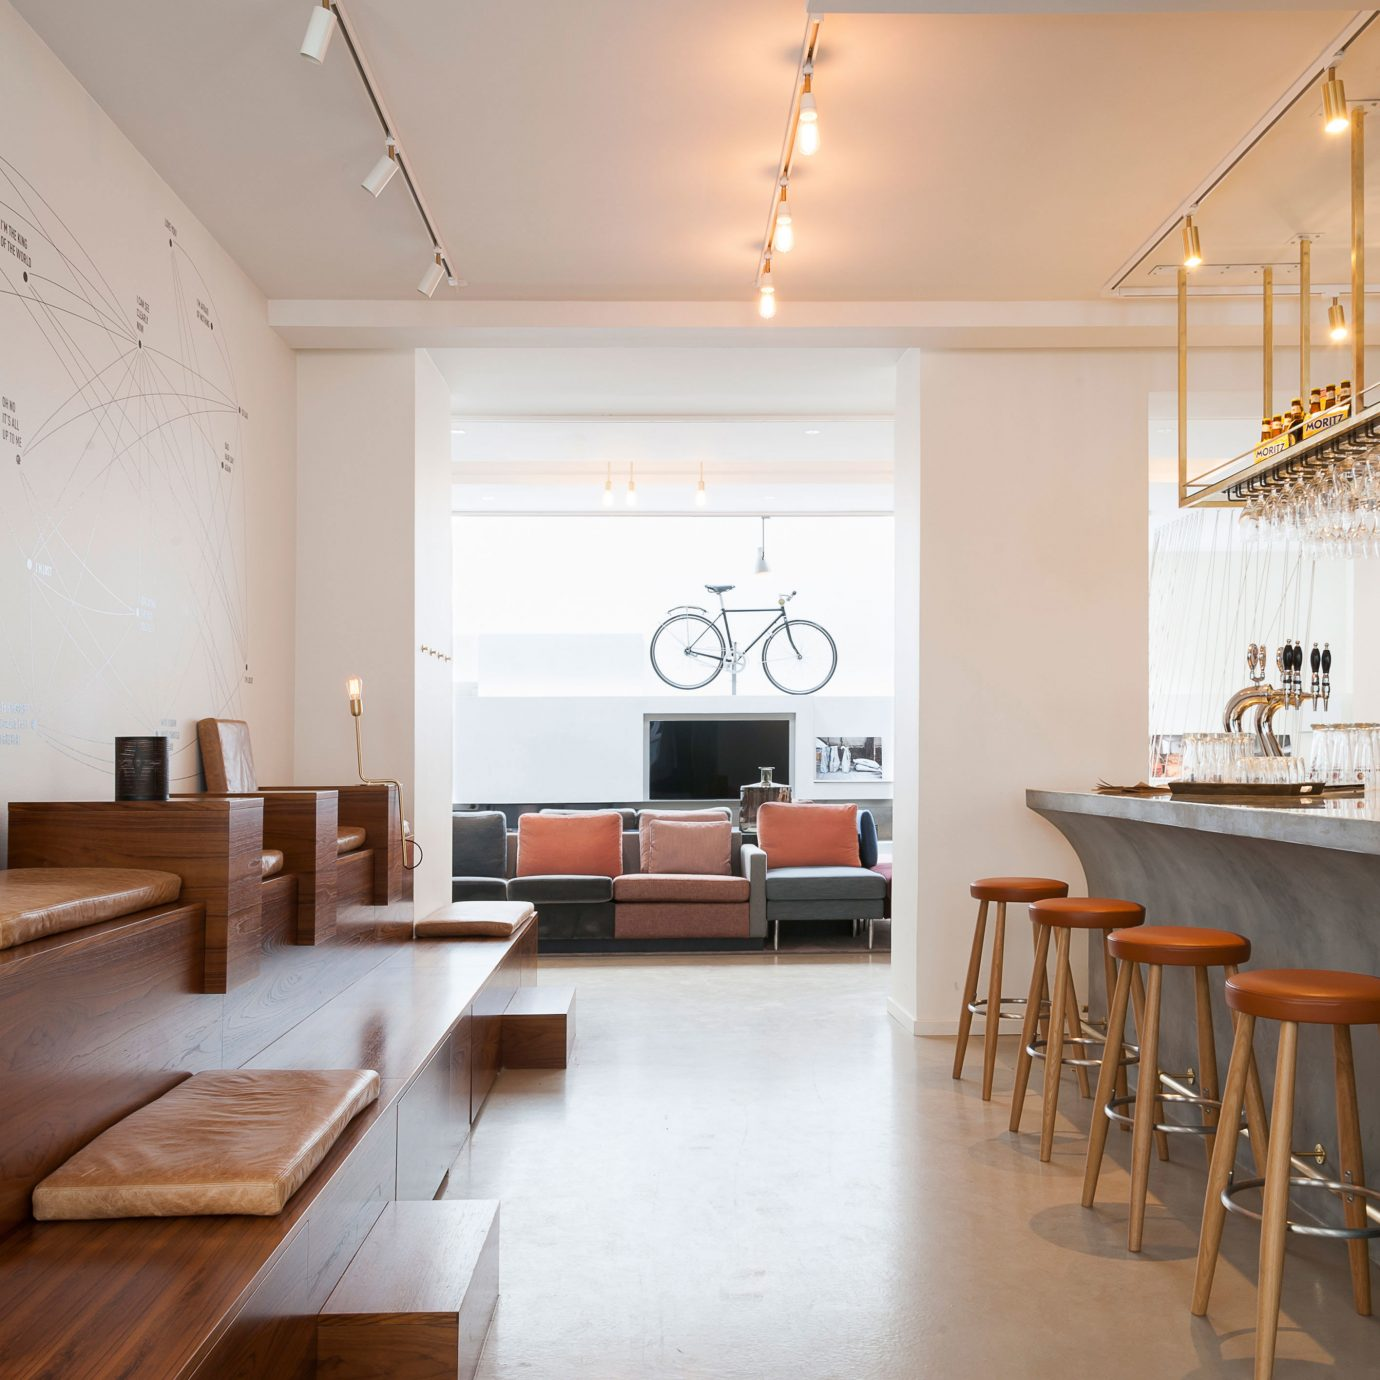 Bar Boutique Hotels Copenhagen Denmark Dining Drink Eat Hip Hotels Luxury Modern Trip Ideas property wooden home living room